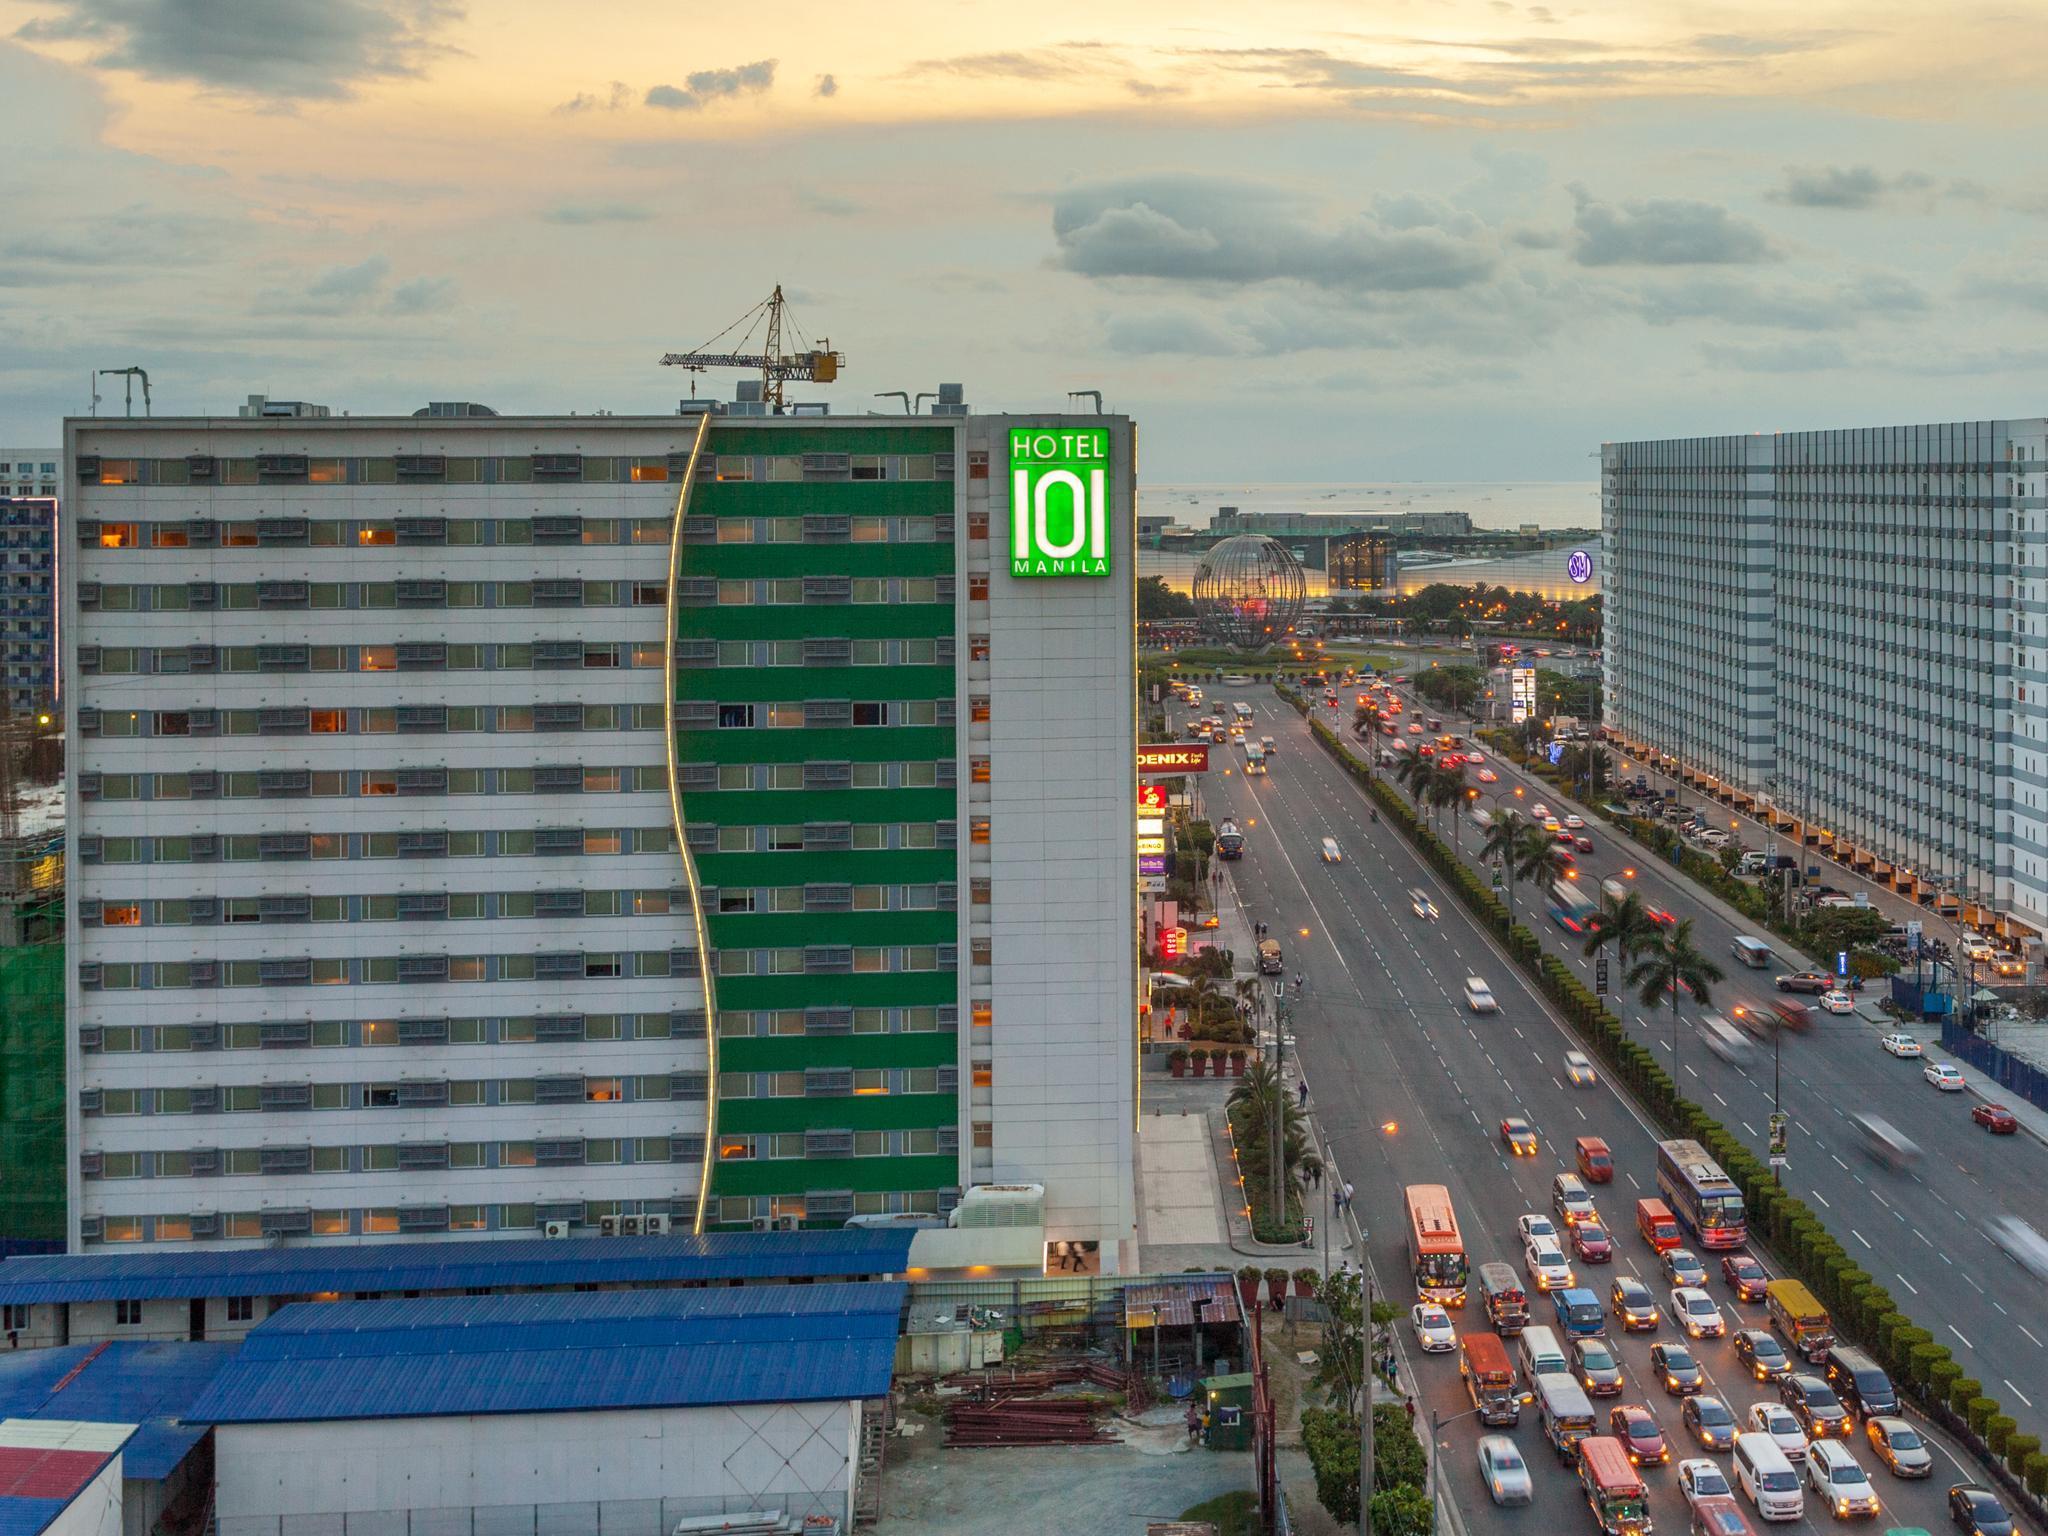 Hotel 101 - Manila